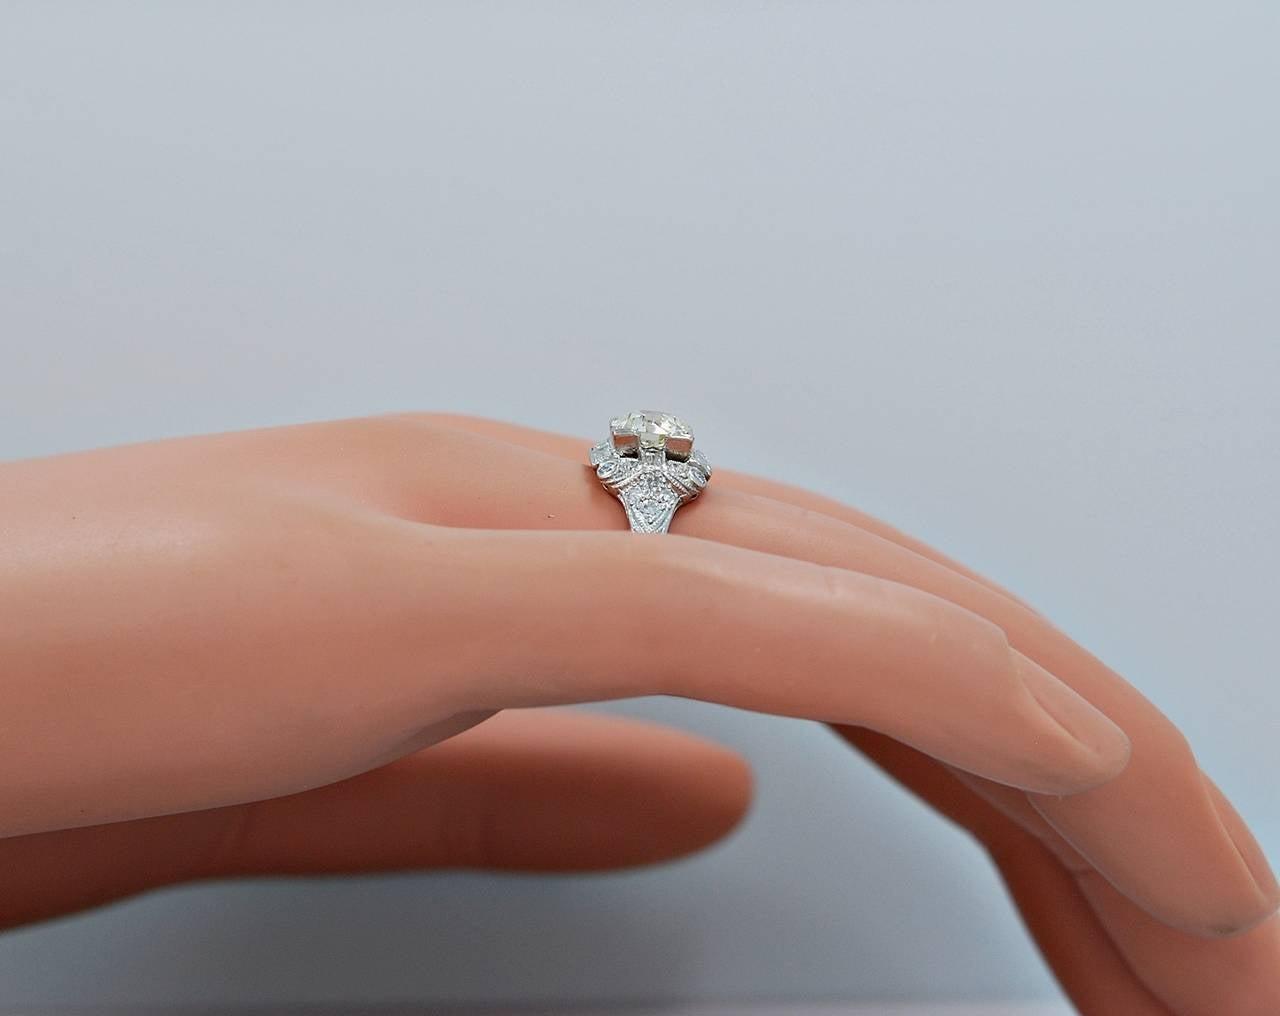 Art Deco Stunning 115 Carat Diamond Platinum Engagement. Shell Paua Engagement Rings. Coin British Rings. Perforated Rings. Wood Wedding Rings. .5 Carat Engagement Rings. Fsu Rings. Iron Banner Wedding Rings. Marrige Wedding Rings